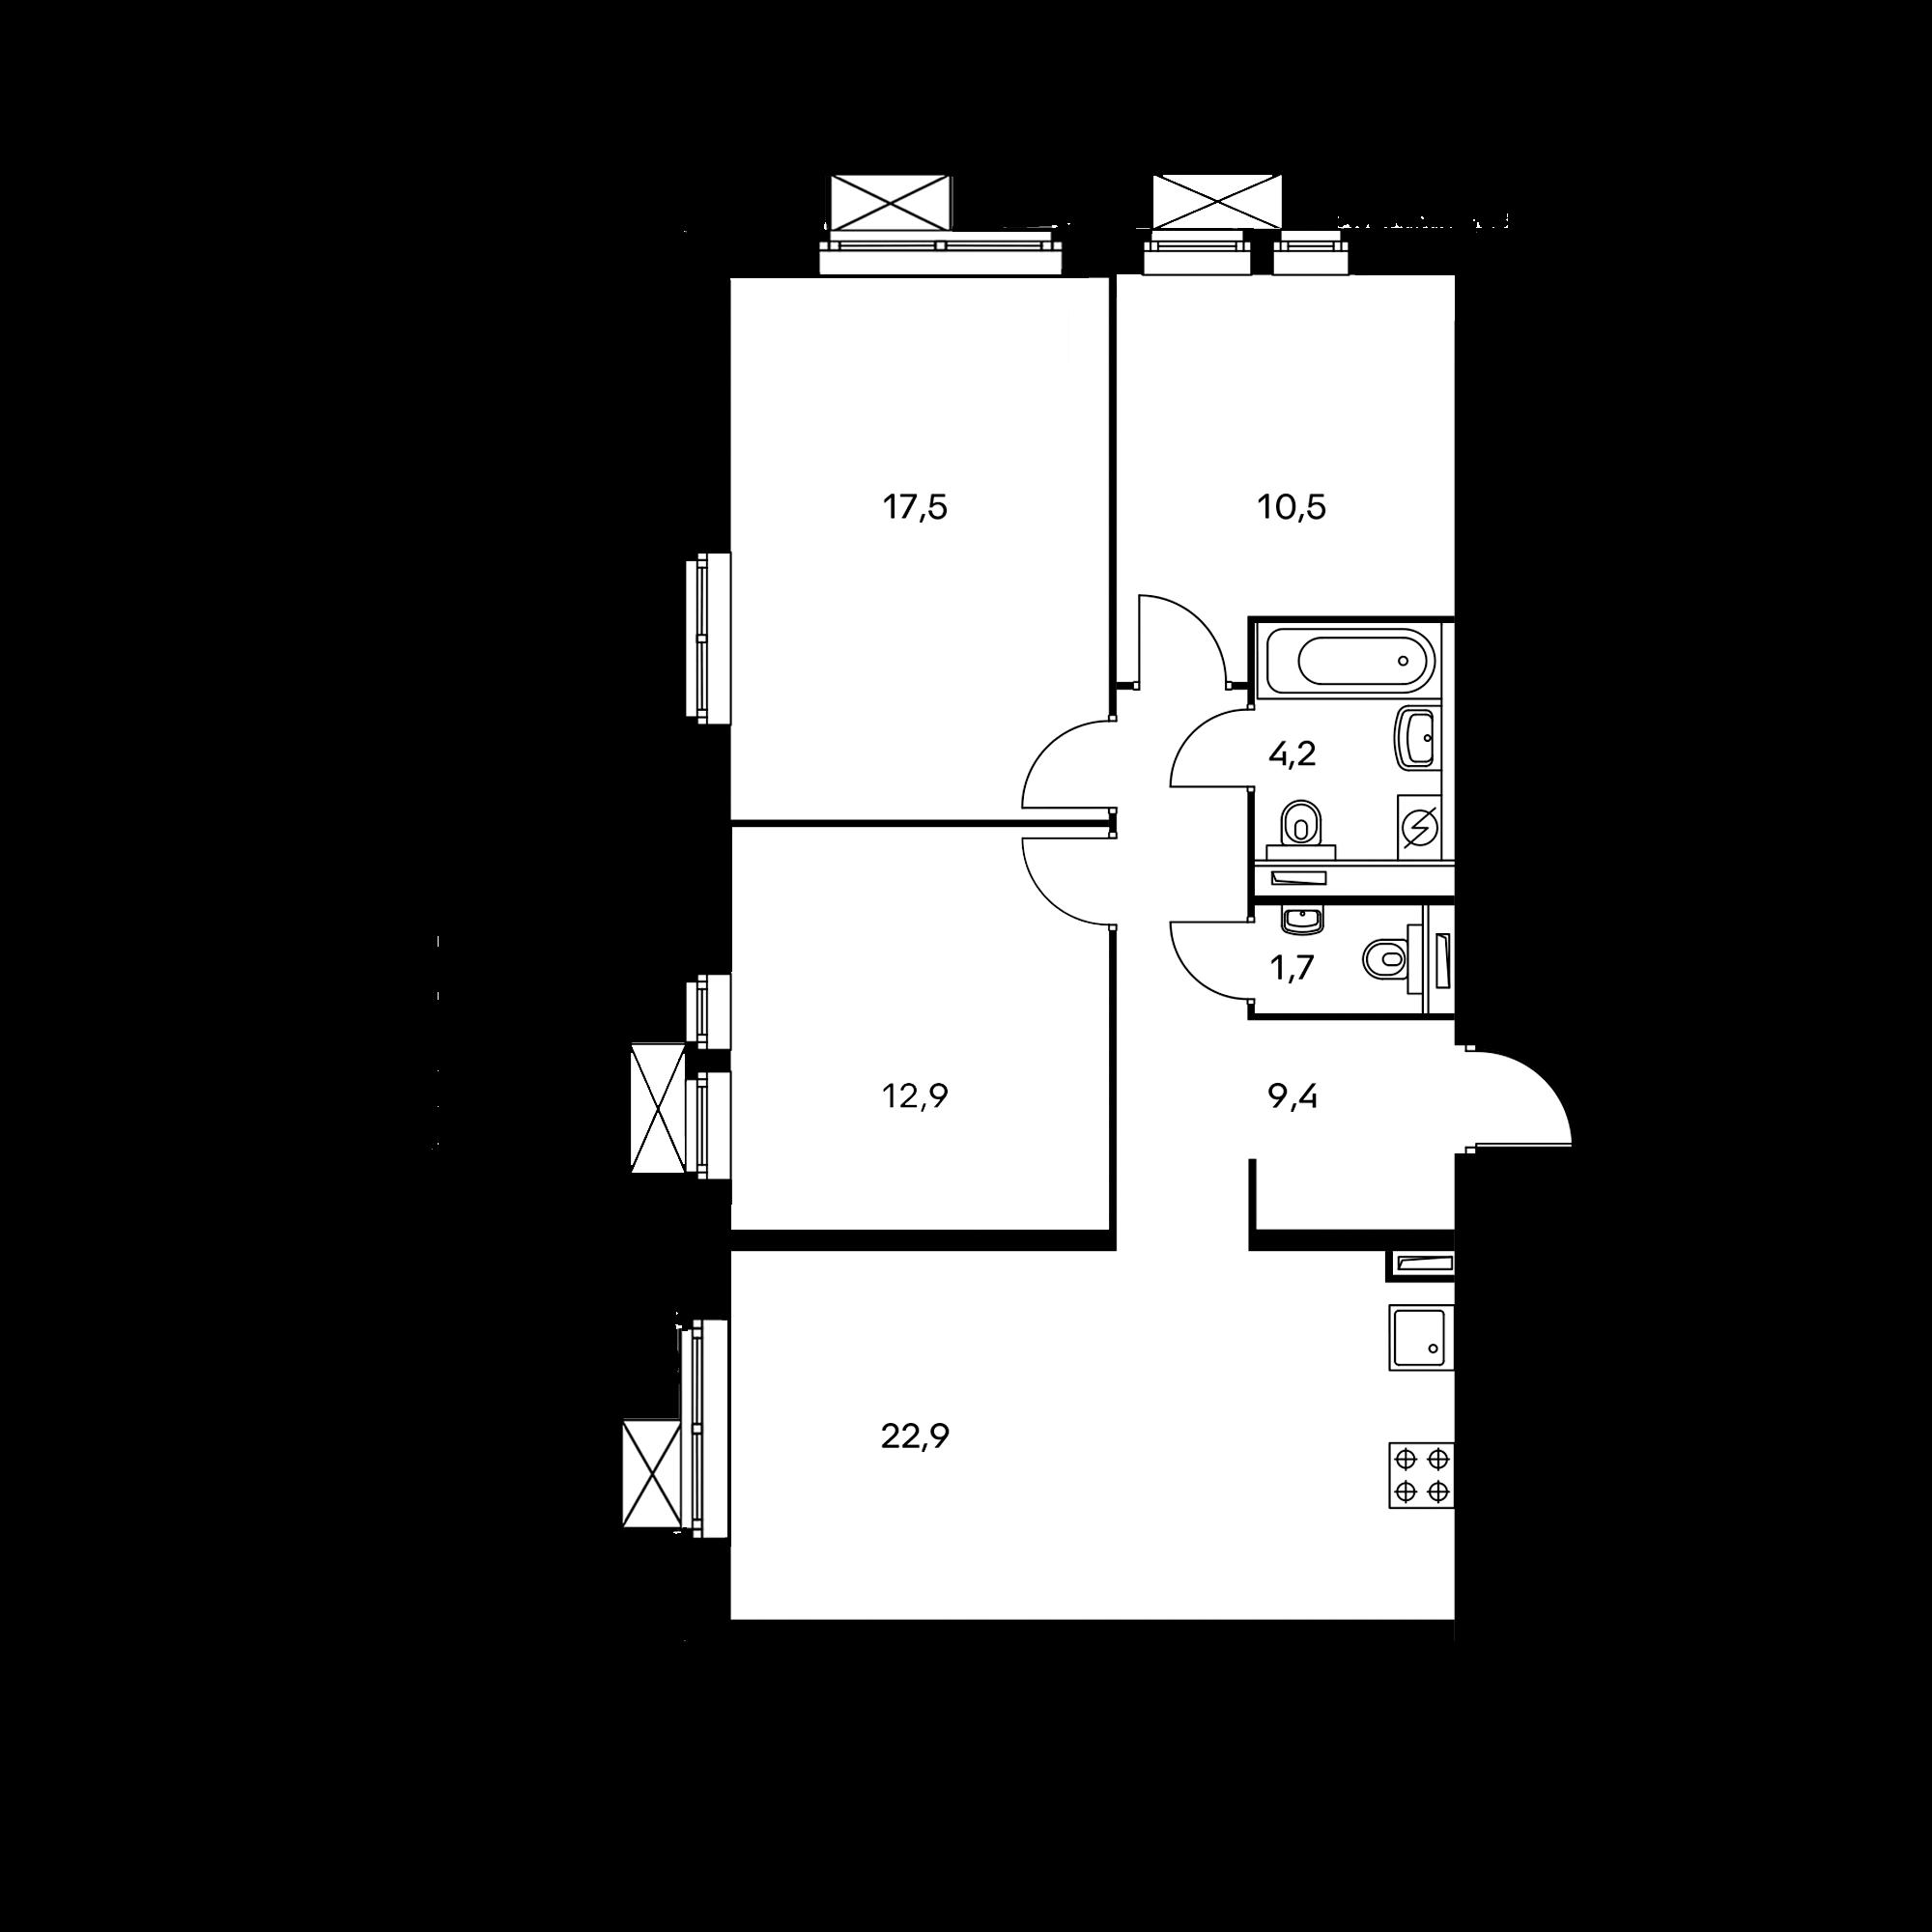 3EM21_6.9-1